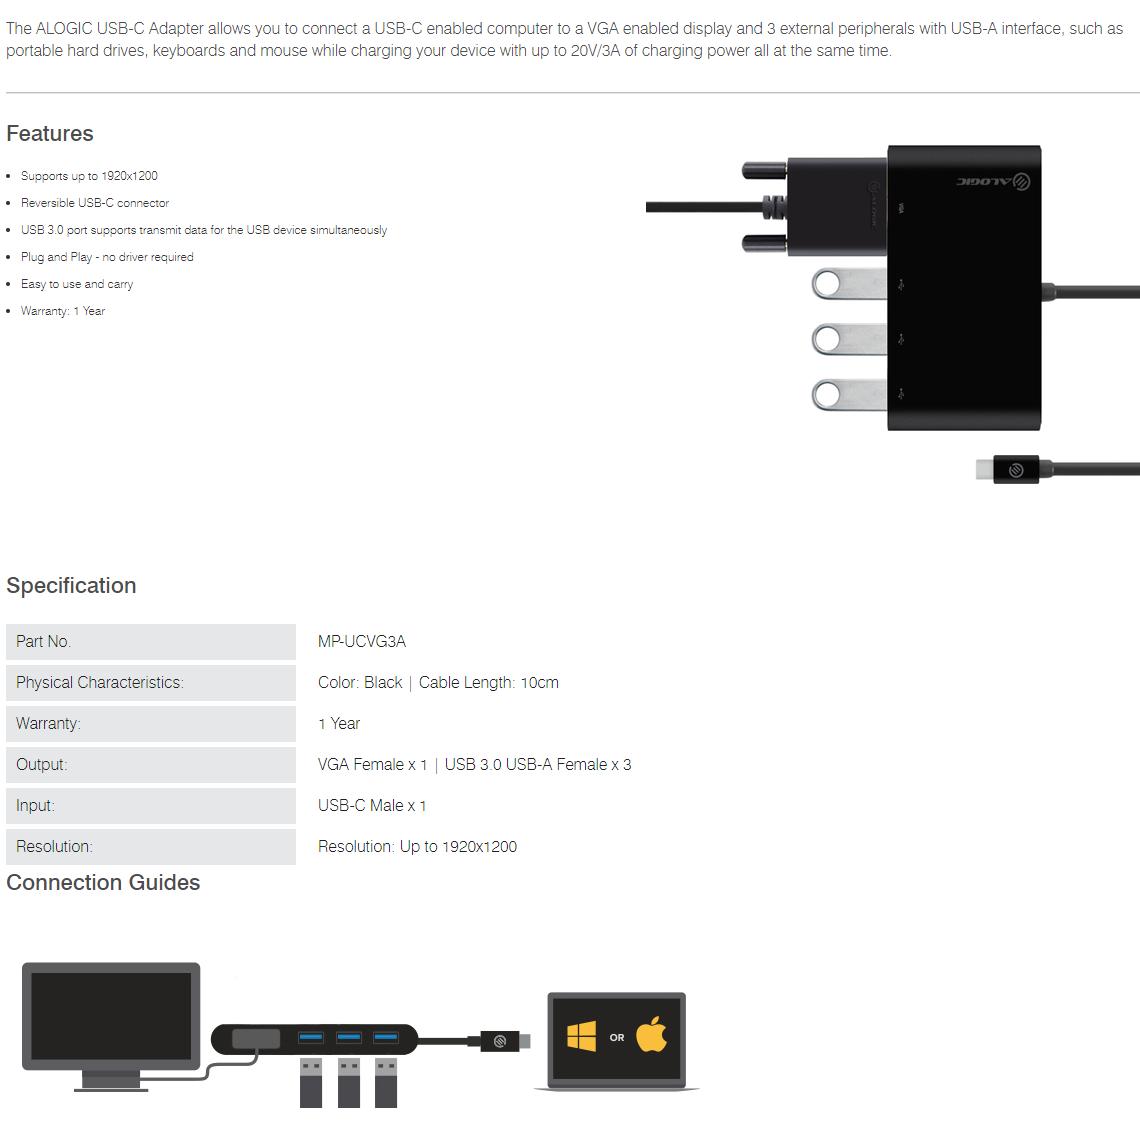 Alogic 10cm USB-C MultiPort Adapter with VGA & 3 Port USB 3.0 Hub MP-UCVG3A